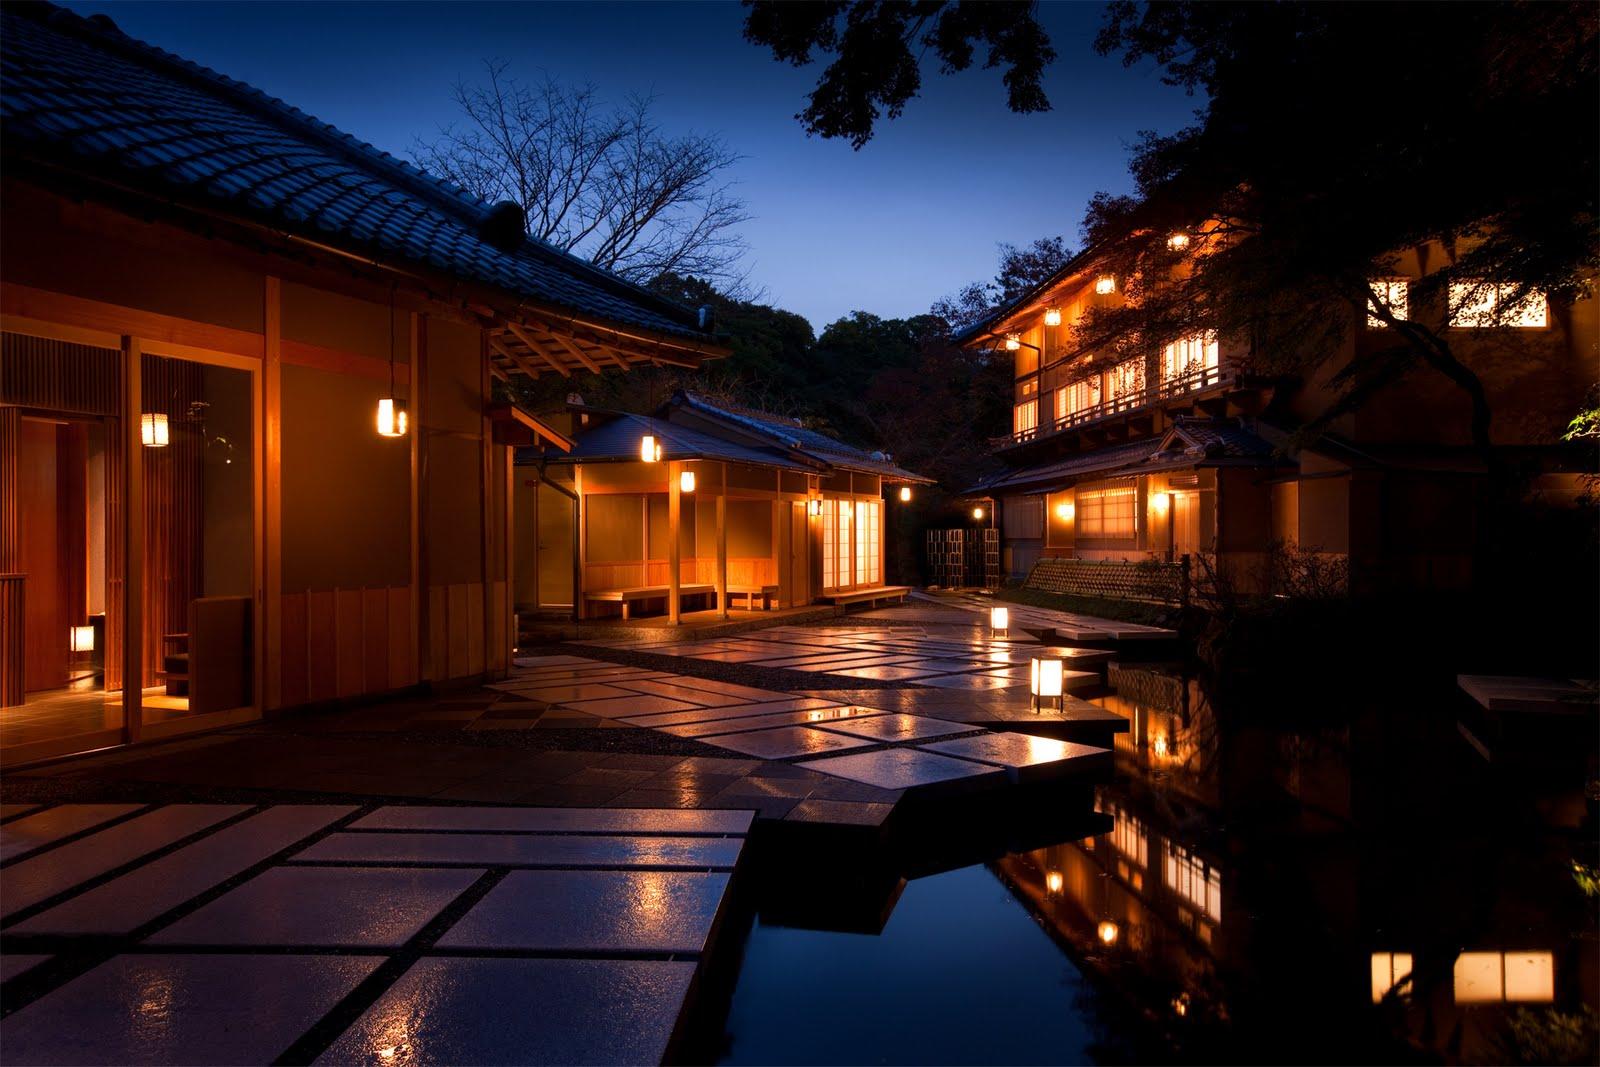 kyoto wallpaper bonsai wallpaper kyoto by night illustration wallpaper 1600x1067